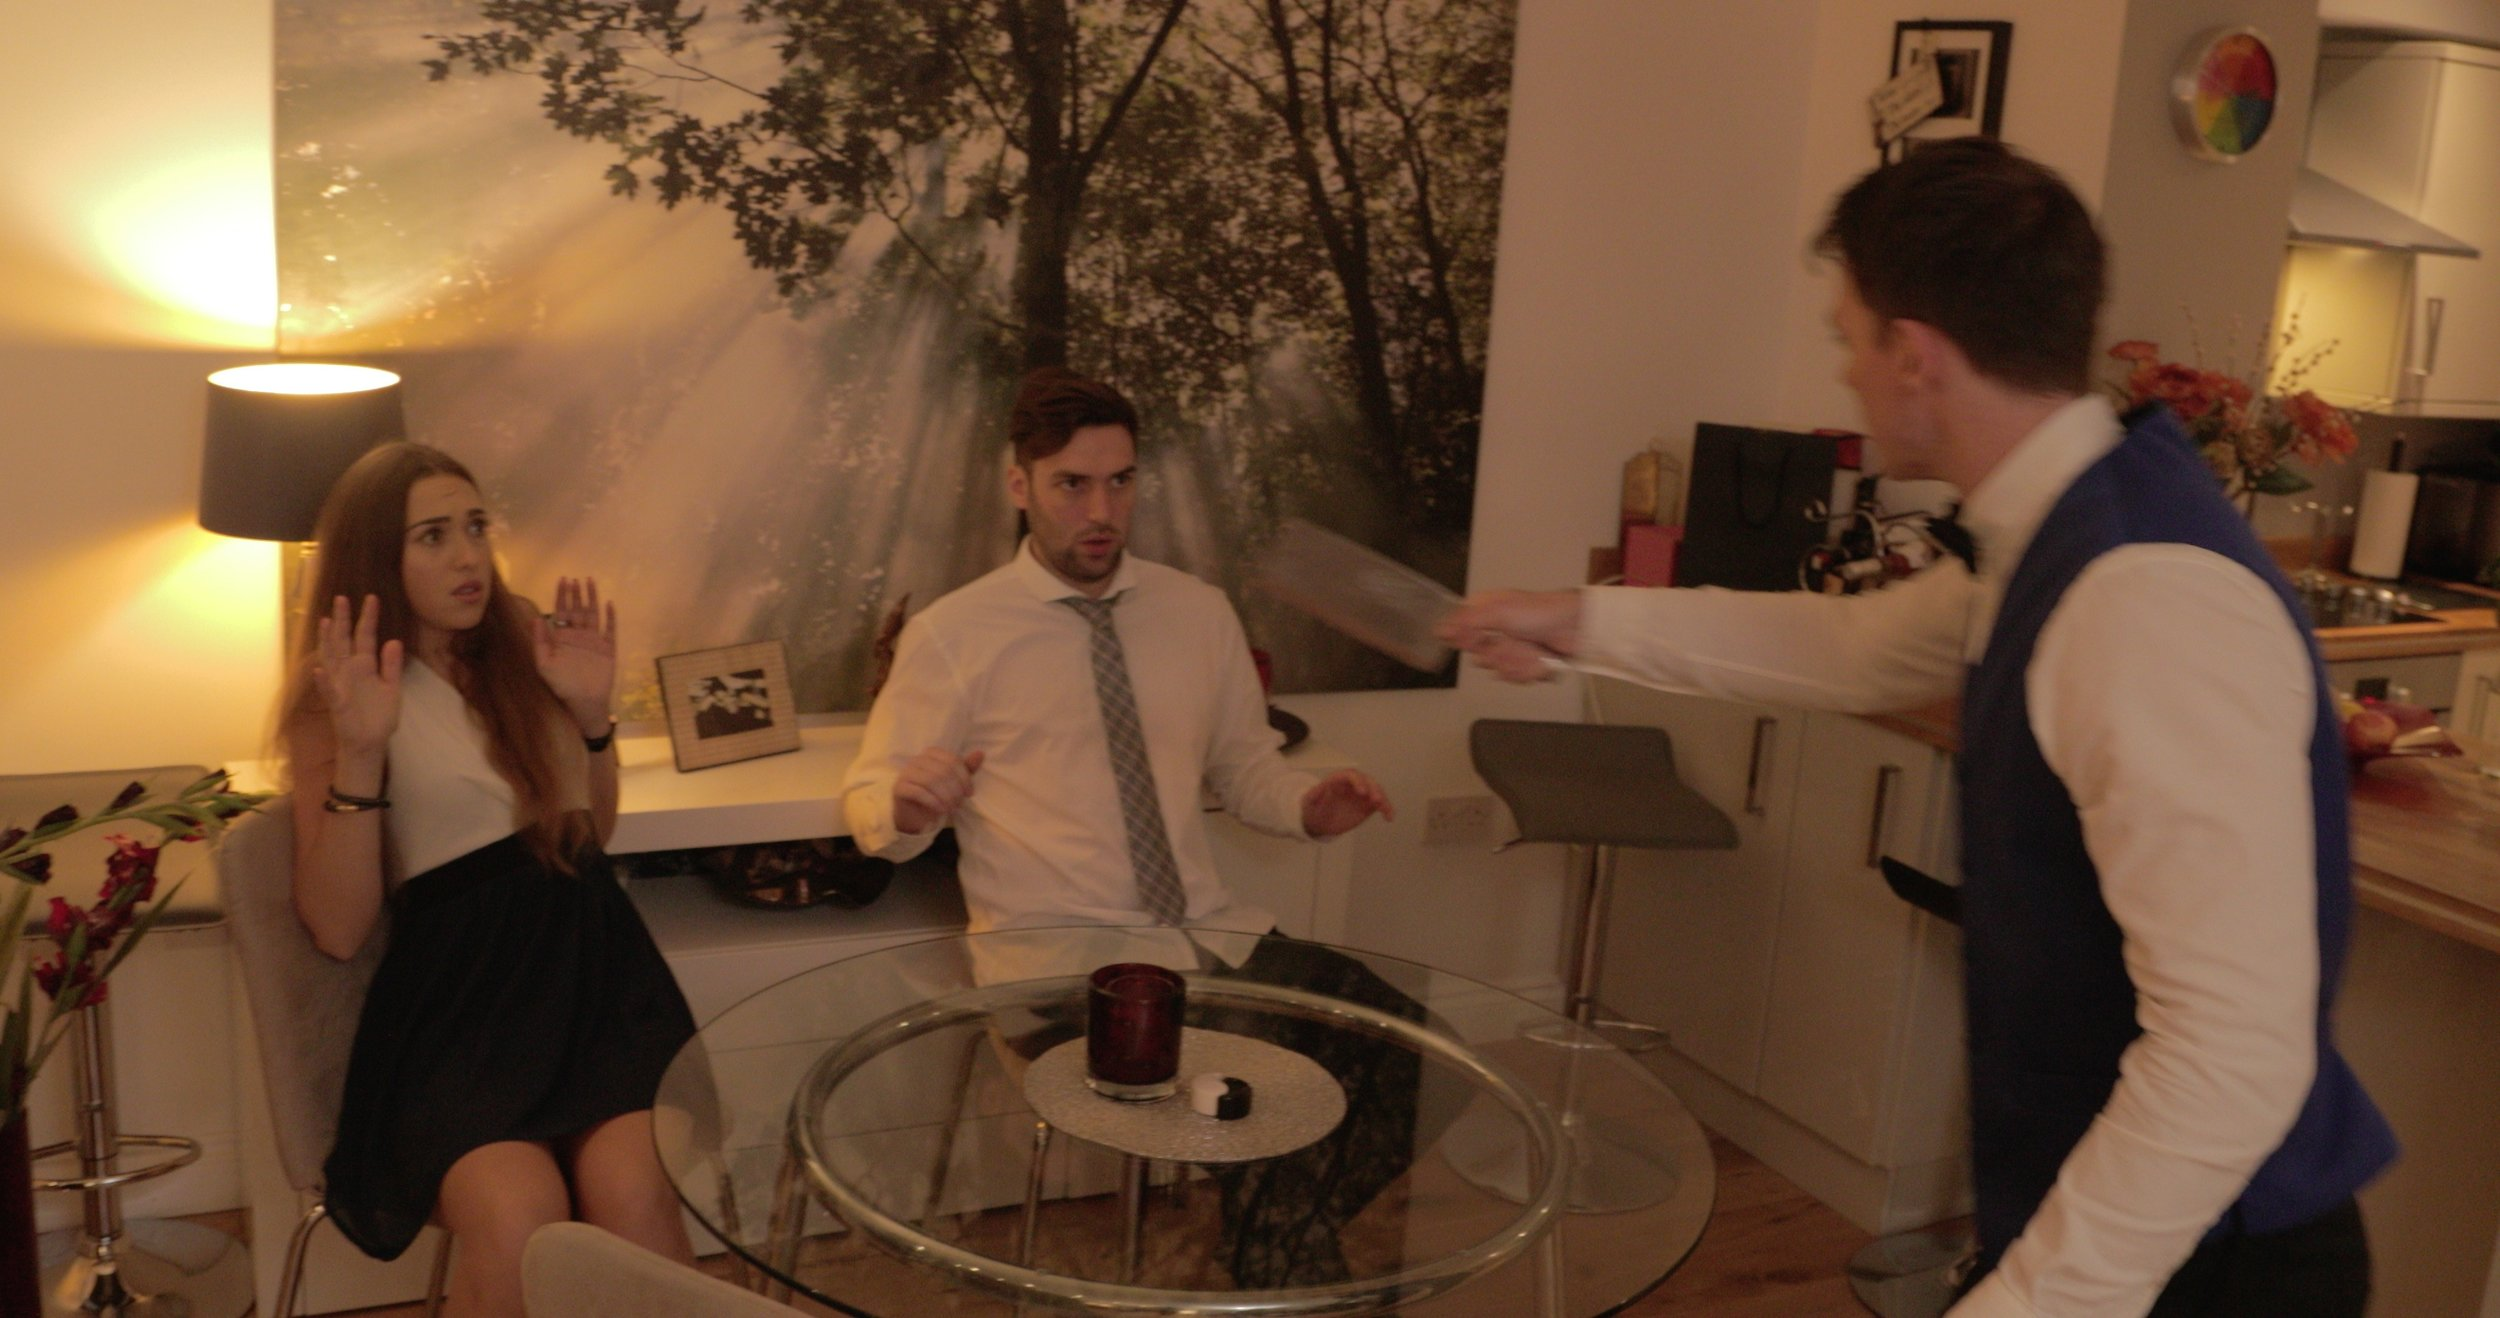 Pizza Night - Writer/Director - 10 min short film in 1 shot - 2017